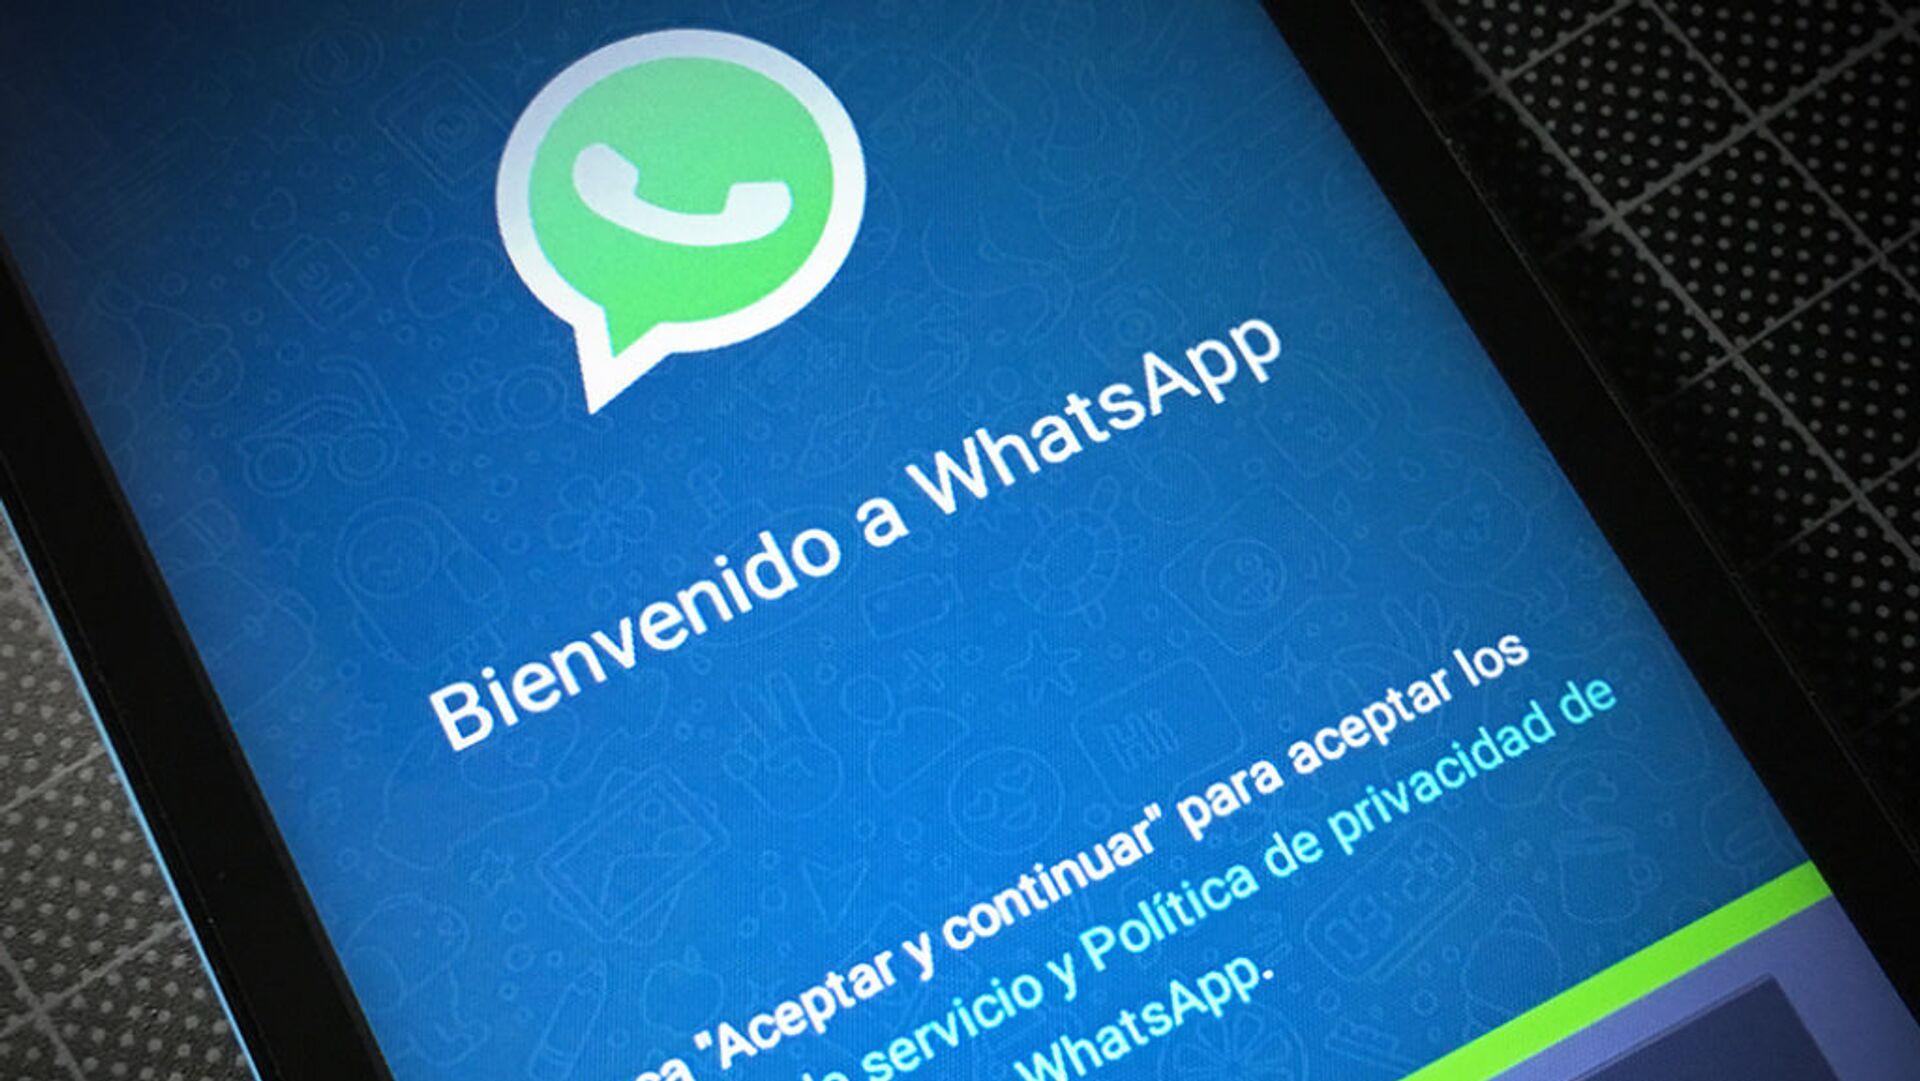 La aplicación de WhatsApp - Sputnik Mundo, 1920, 21.04.2021